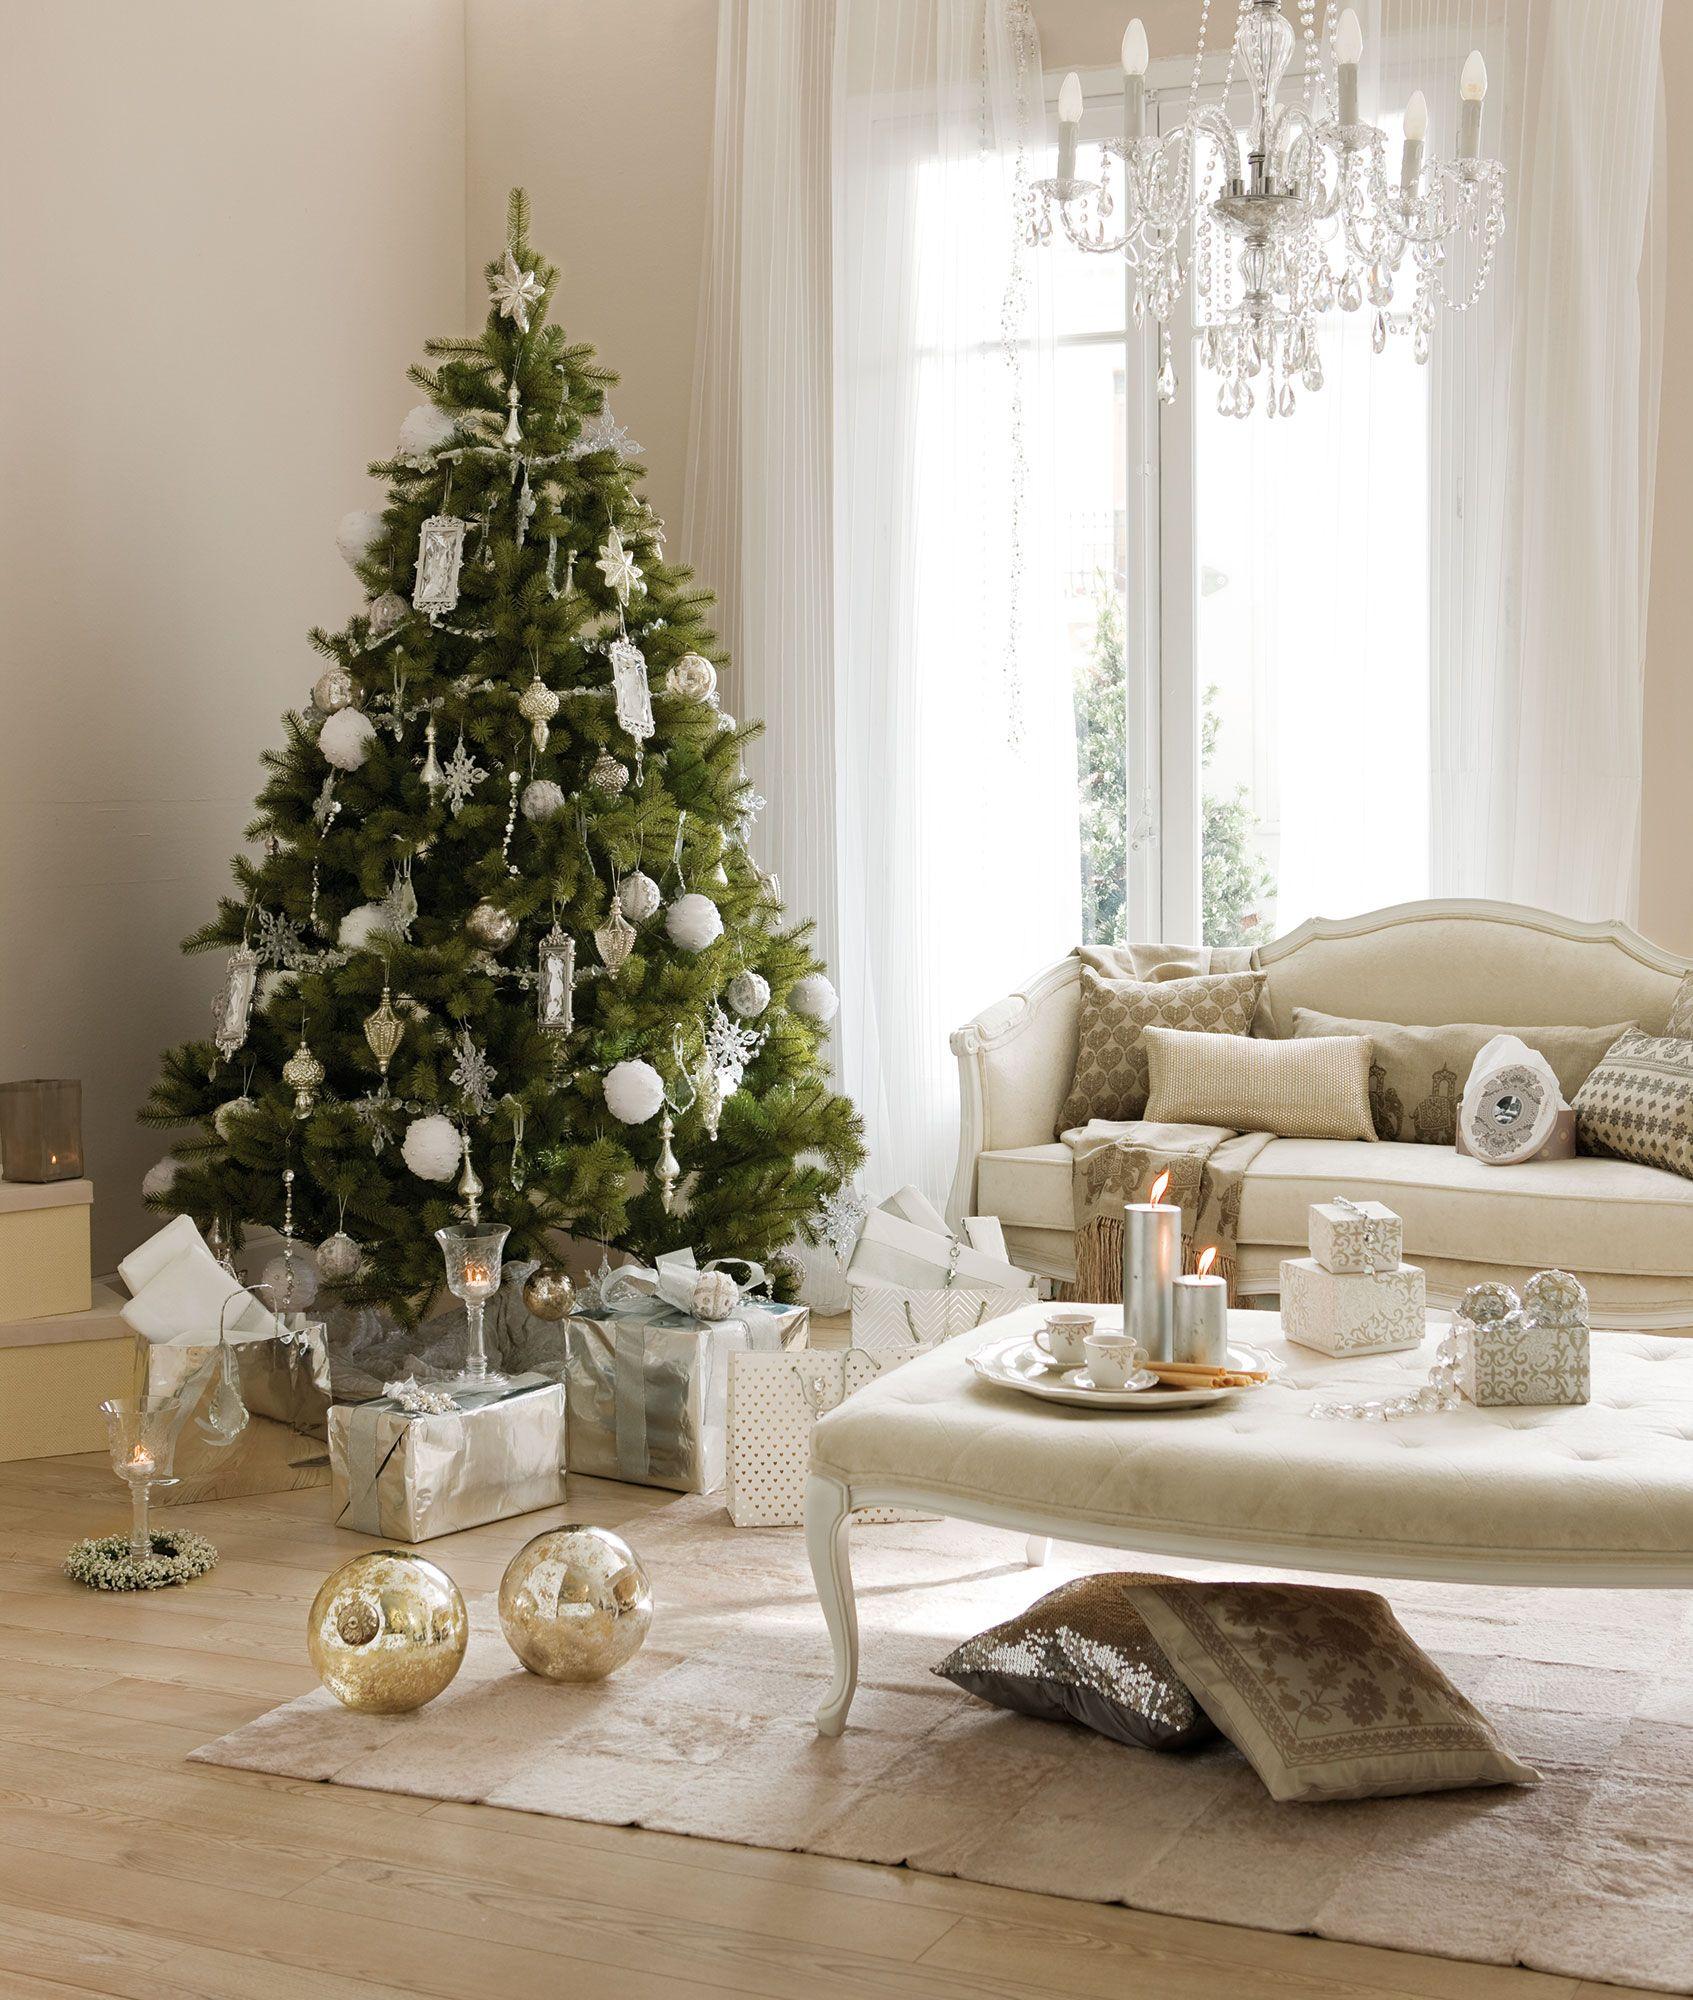 Detalles e ideas en plata para decorar tu casa esta for Decorar casa minimalista navidad